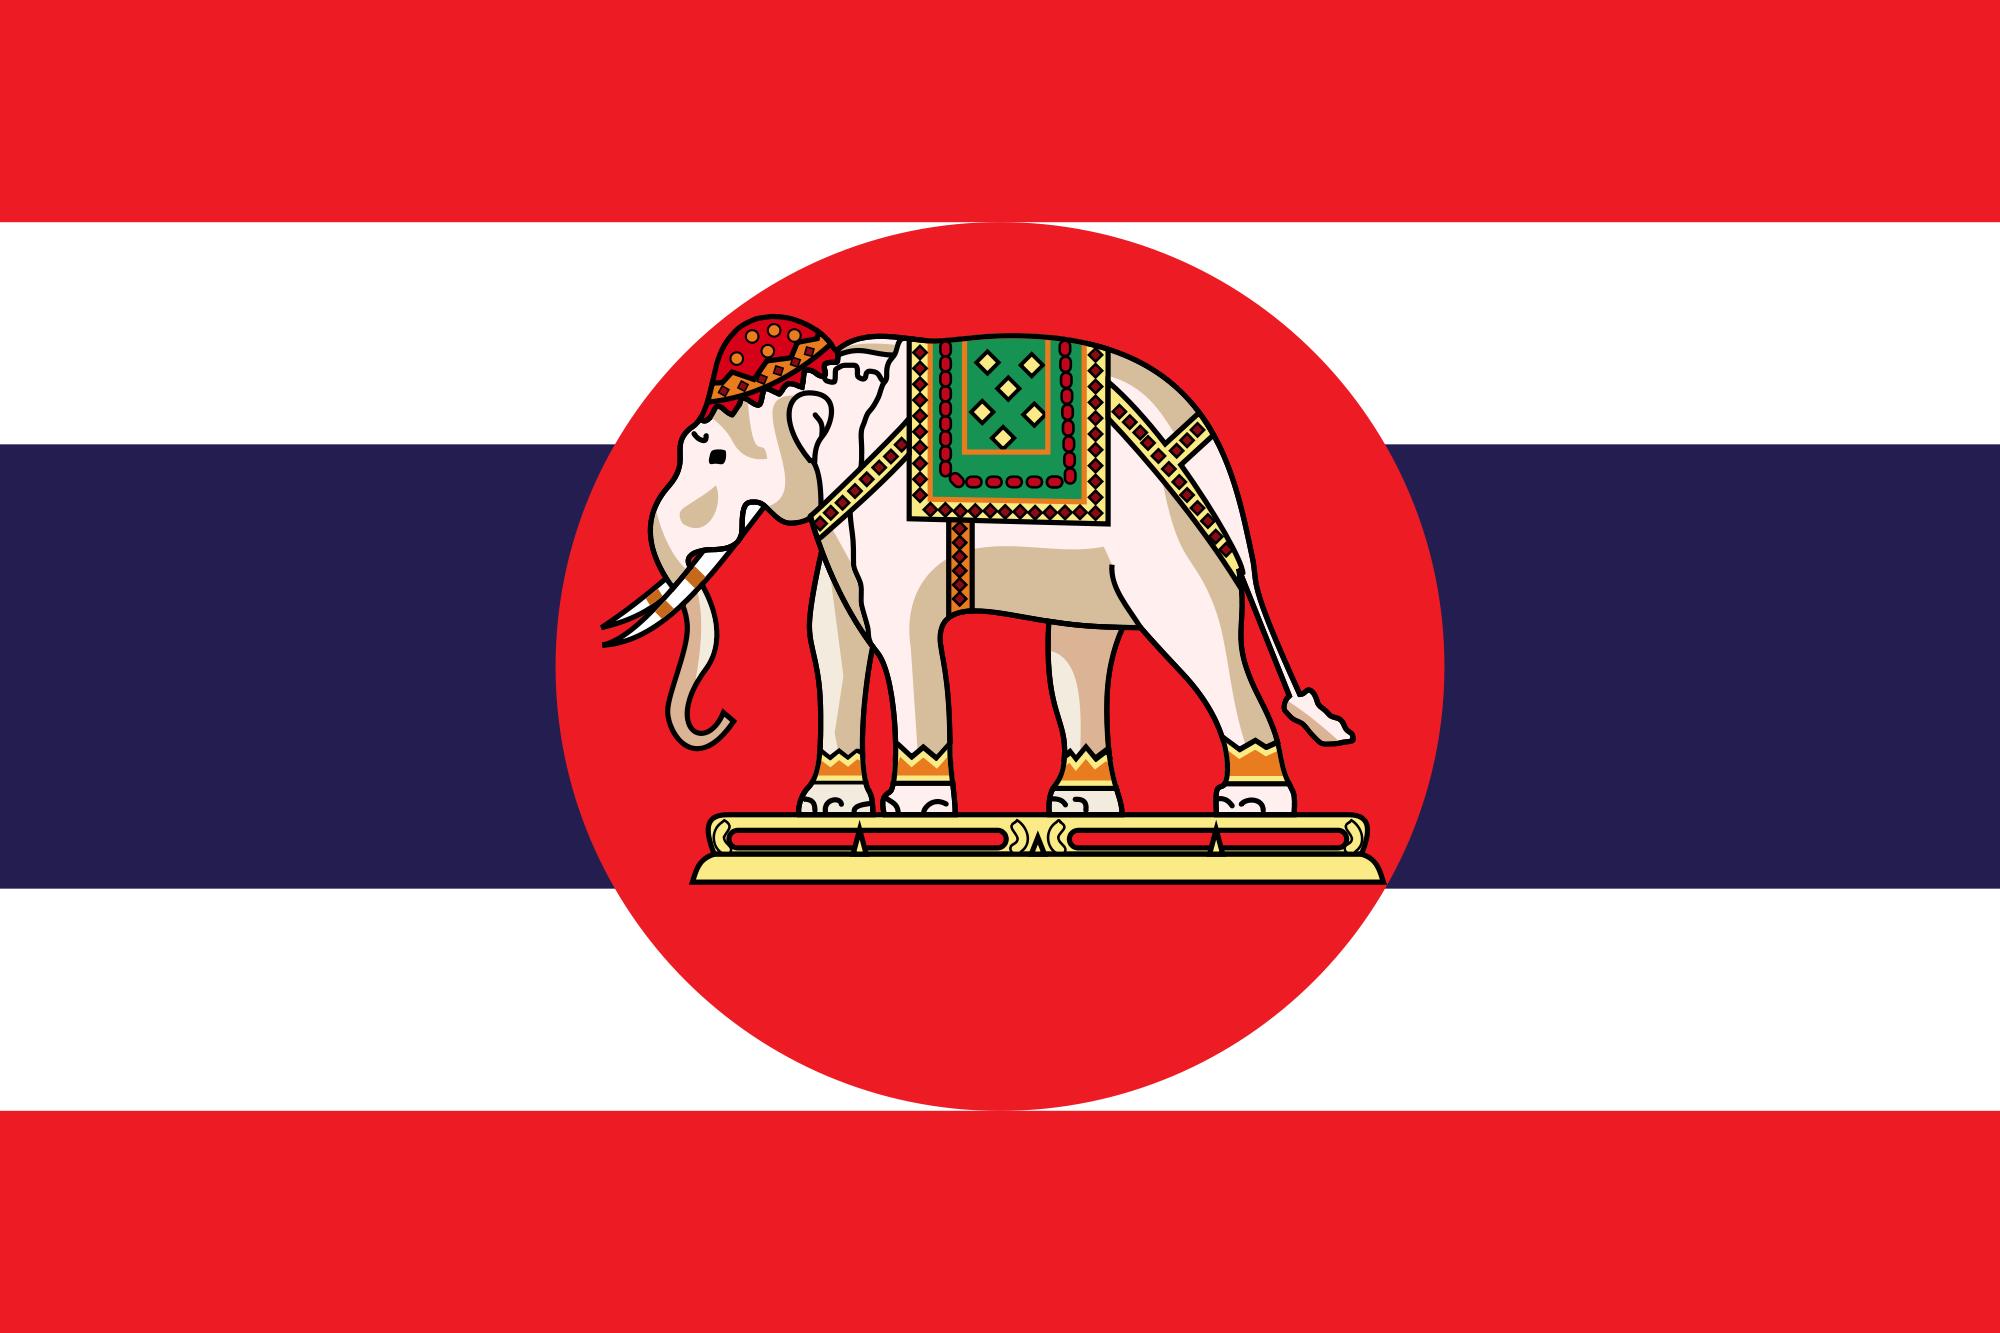 Thailand (Naval ensign)